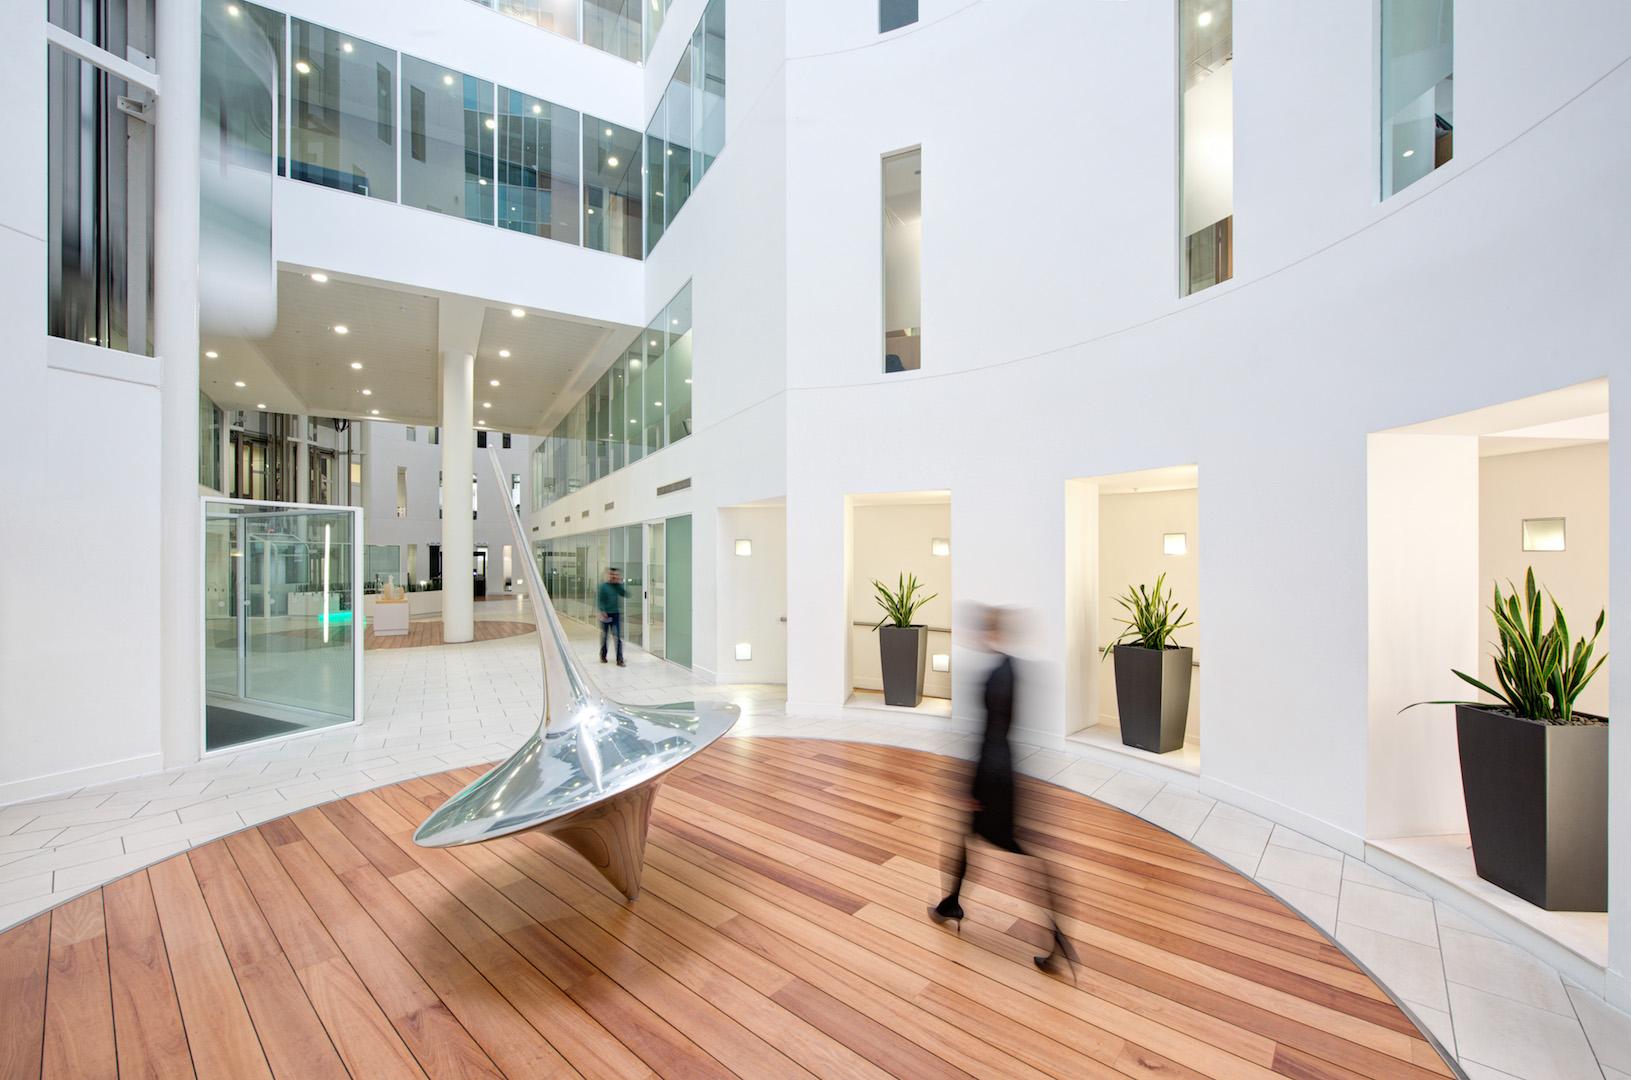 Helix Property lobby 2 Case Study Image